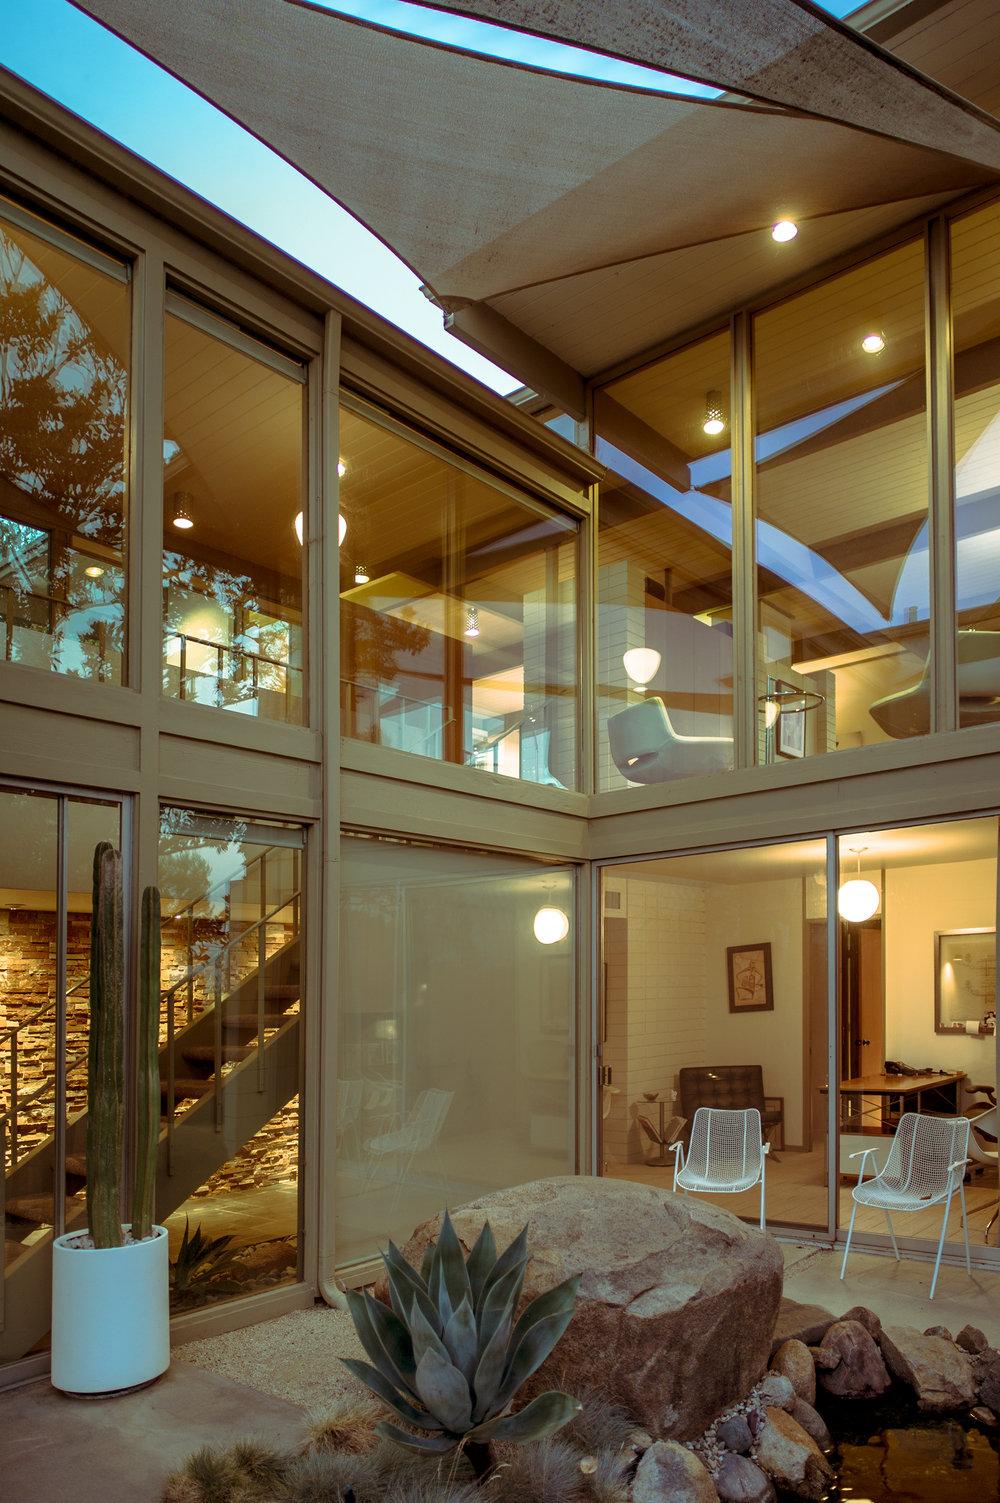 Hindman residence. Jock Mock architect, 1961